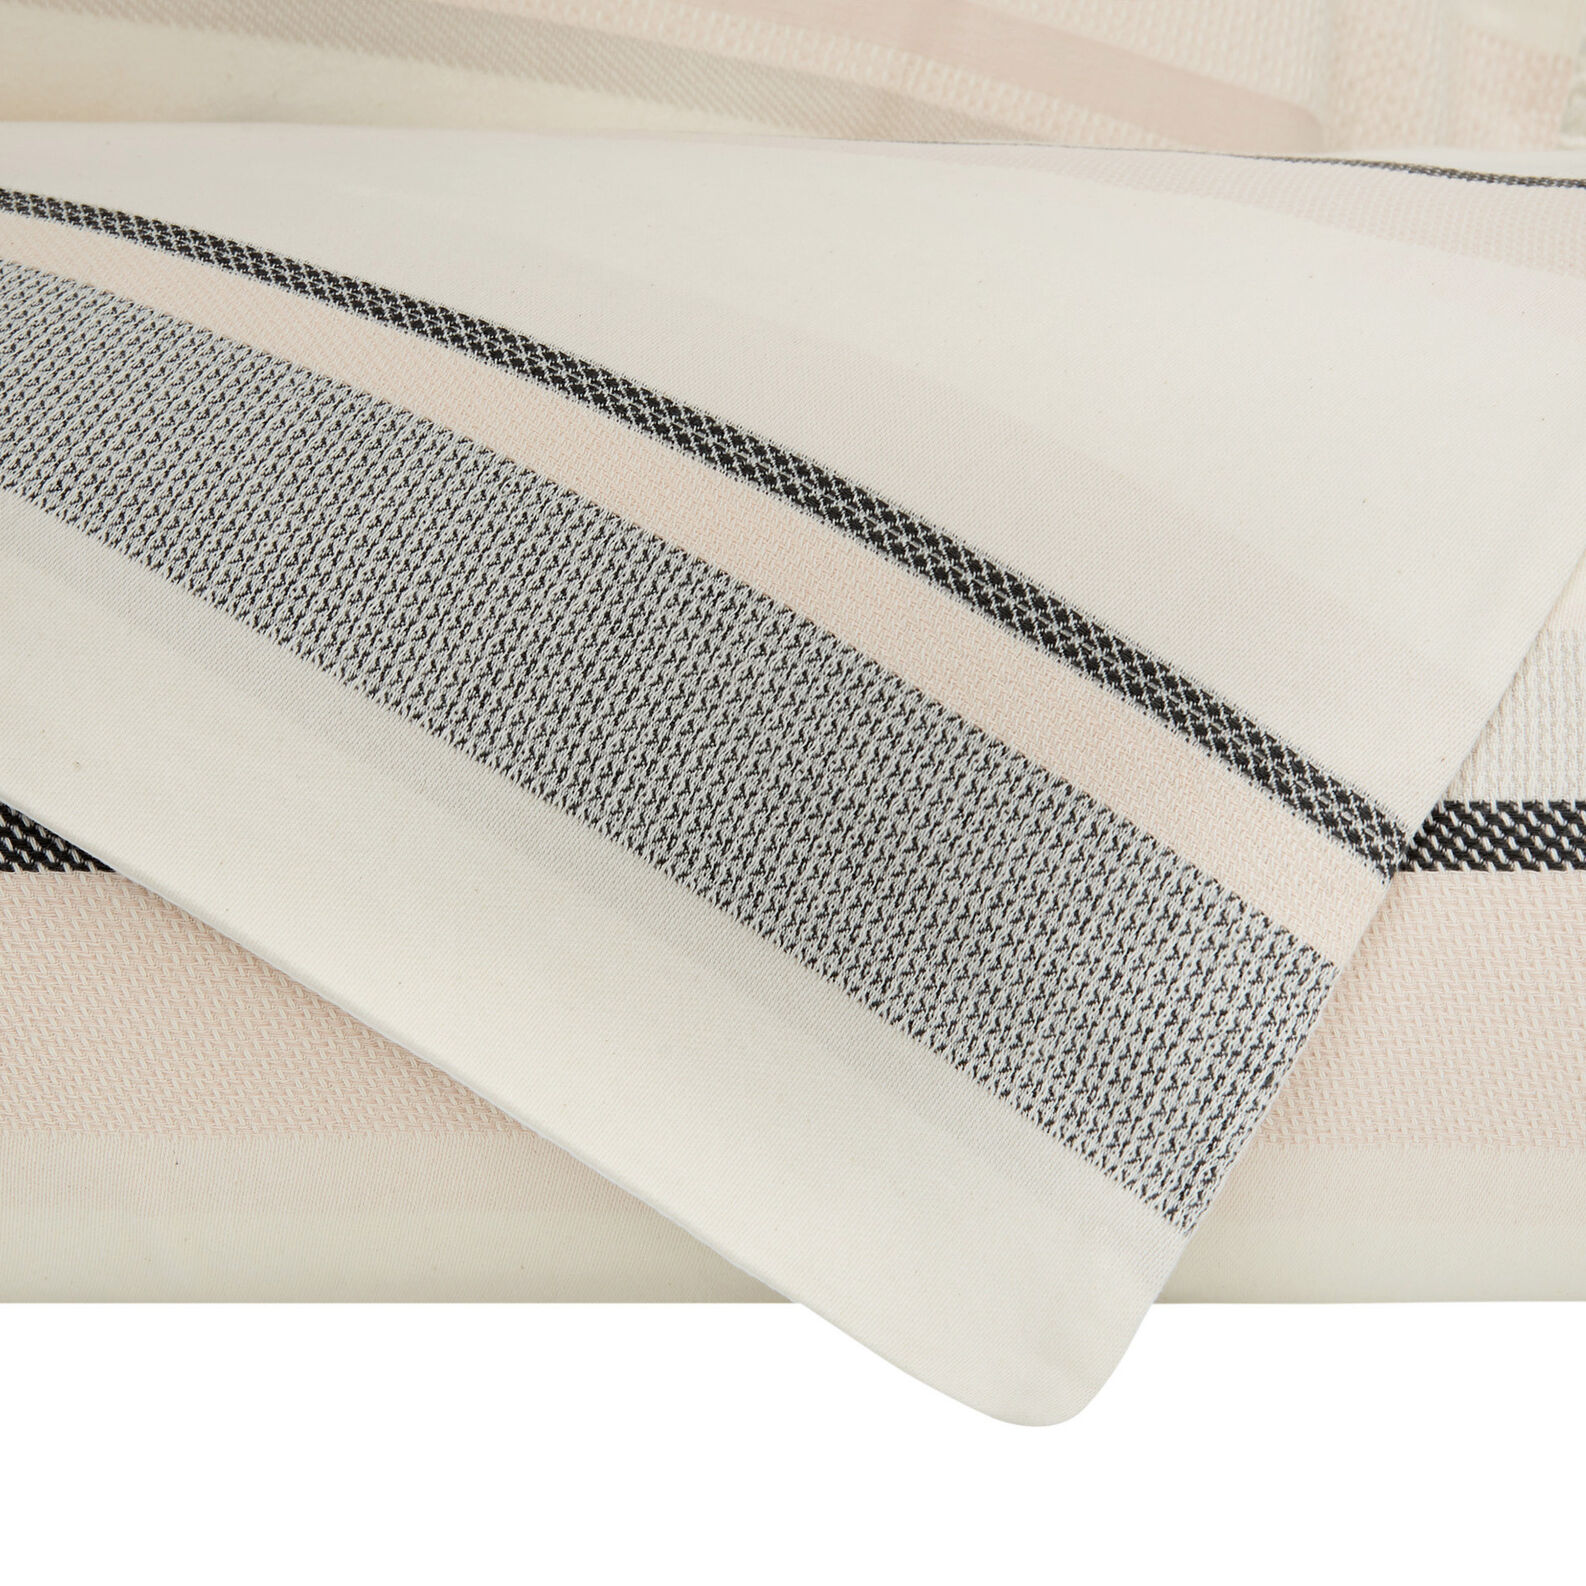 Cotton jacquard striped duvet cover